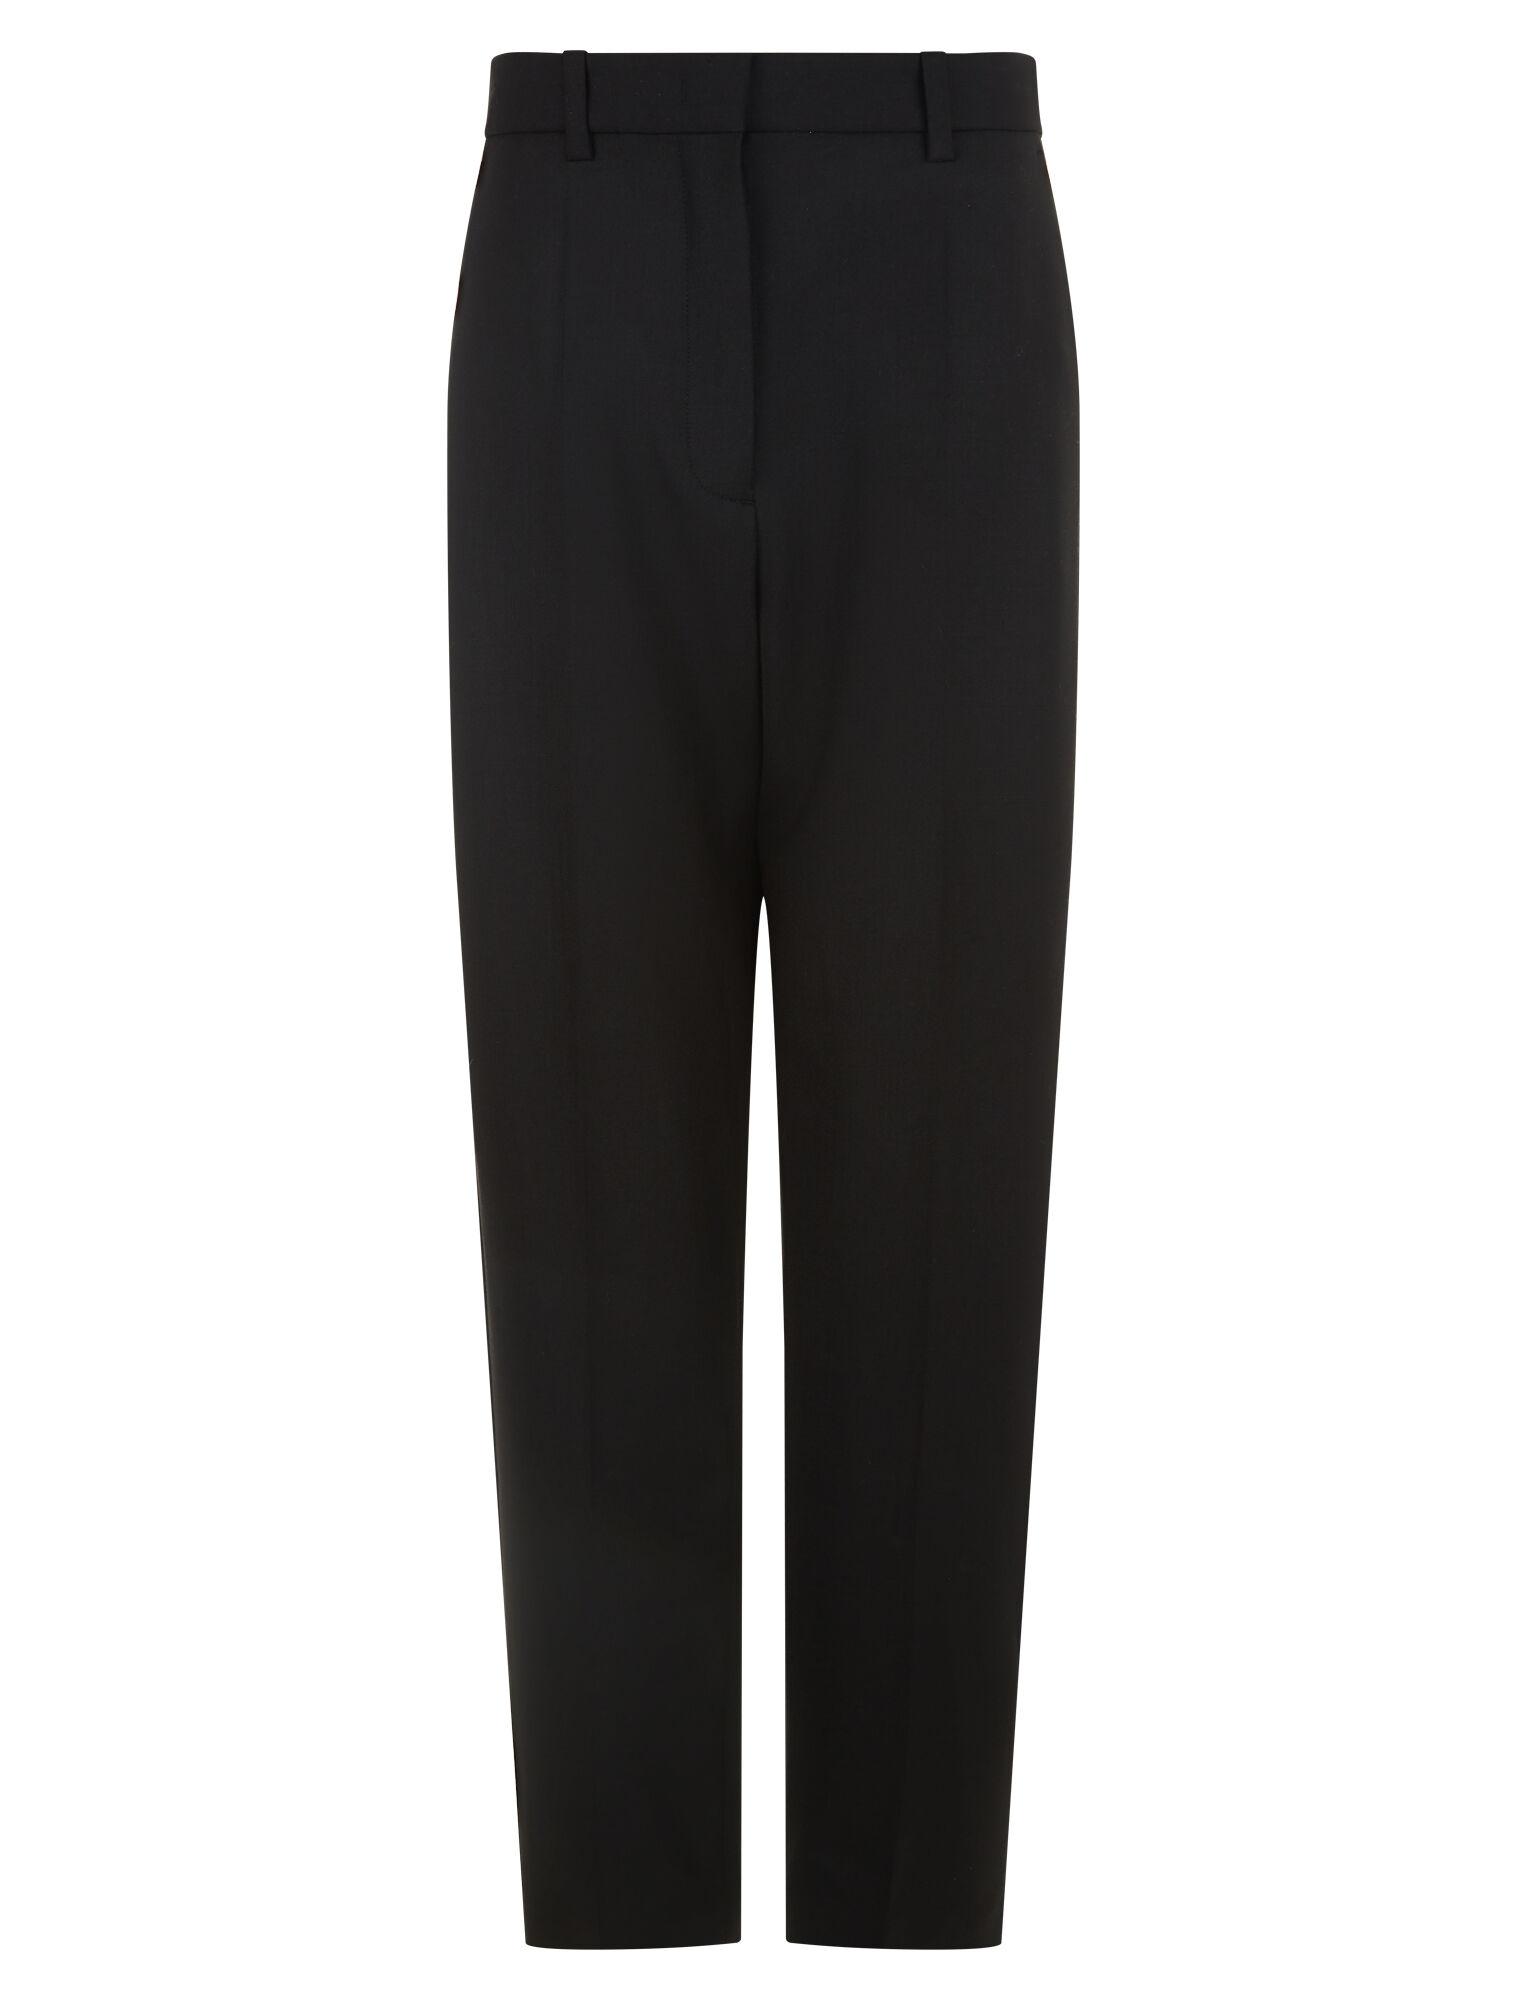 Joseph, Electra Comfort Wool Trousers, in BLACK